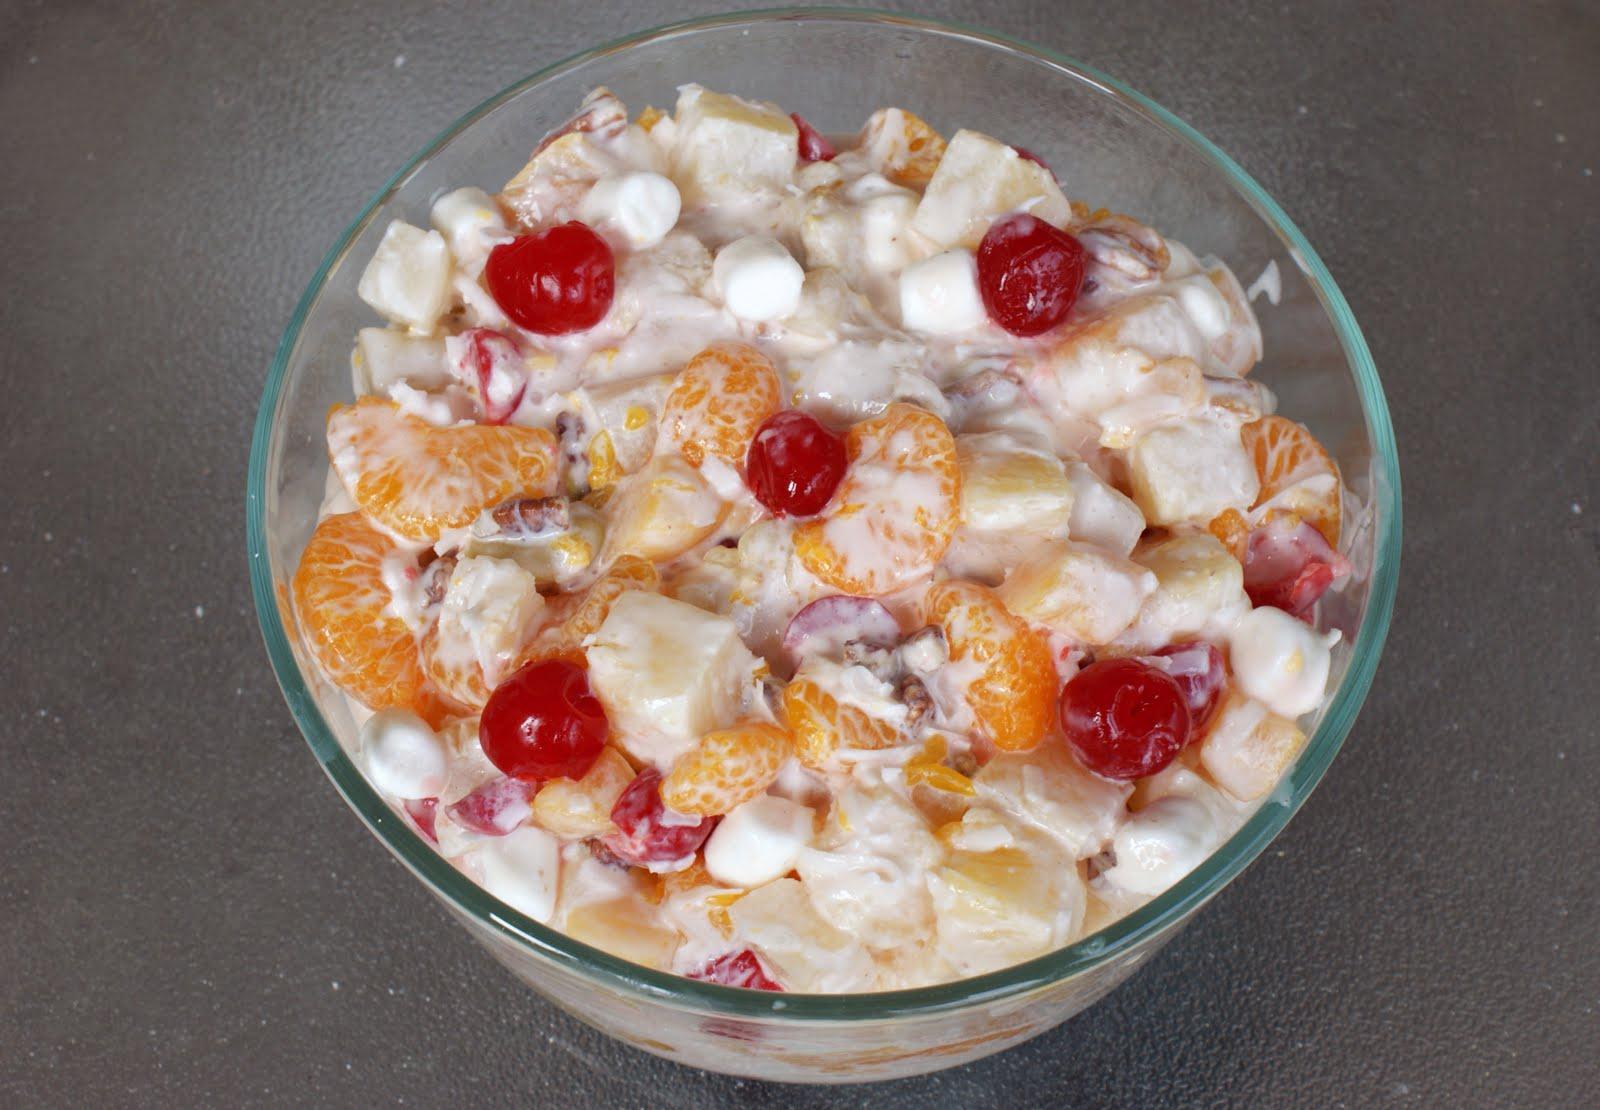 ambrosia fruit salad recipe allrecipes com